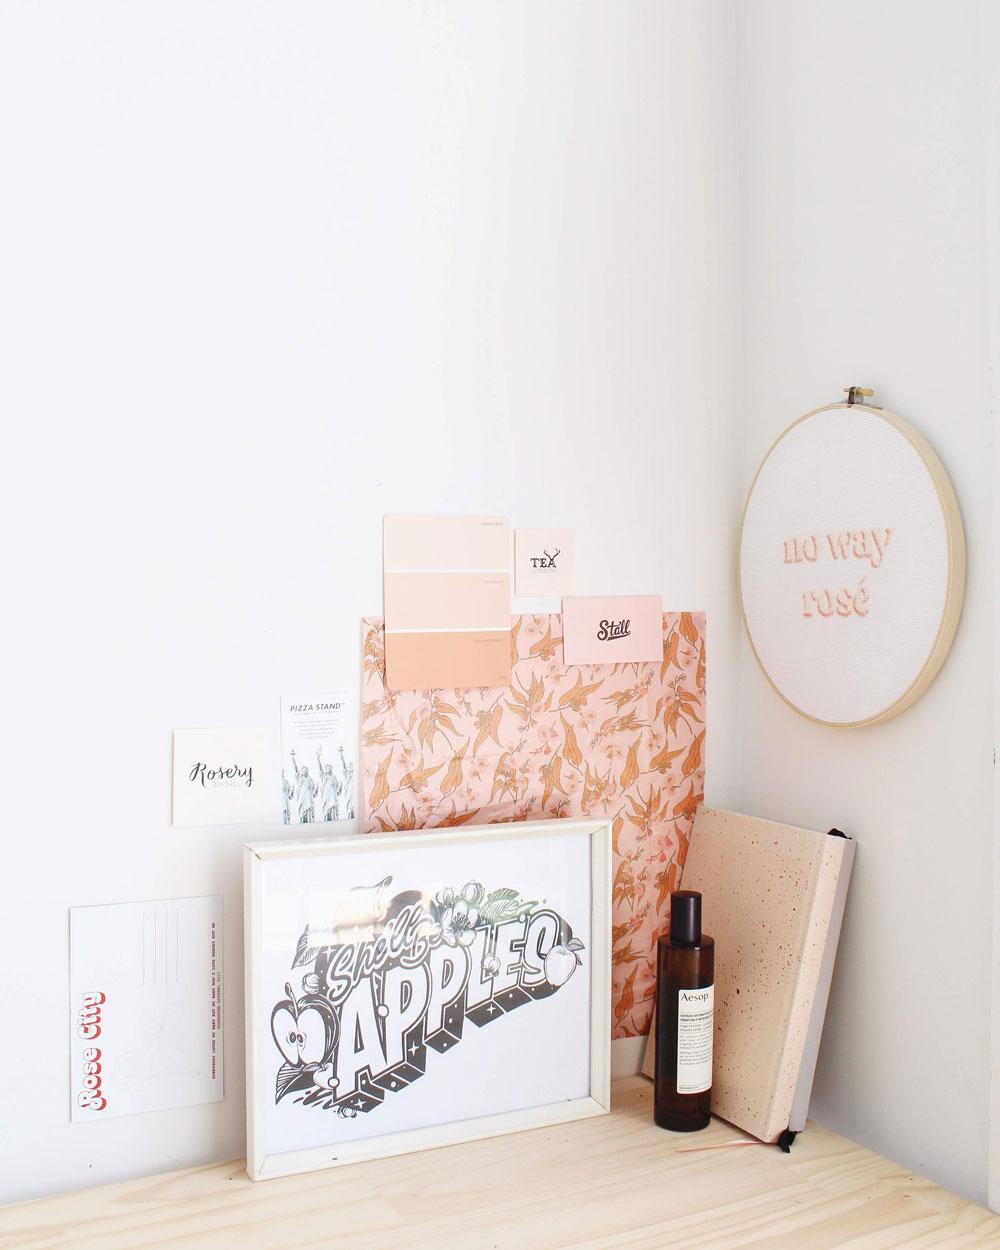 behind the brand 1 rosery apparel mood board.jpg